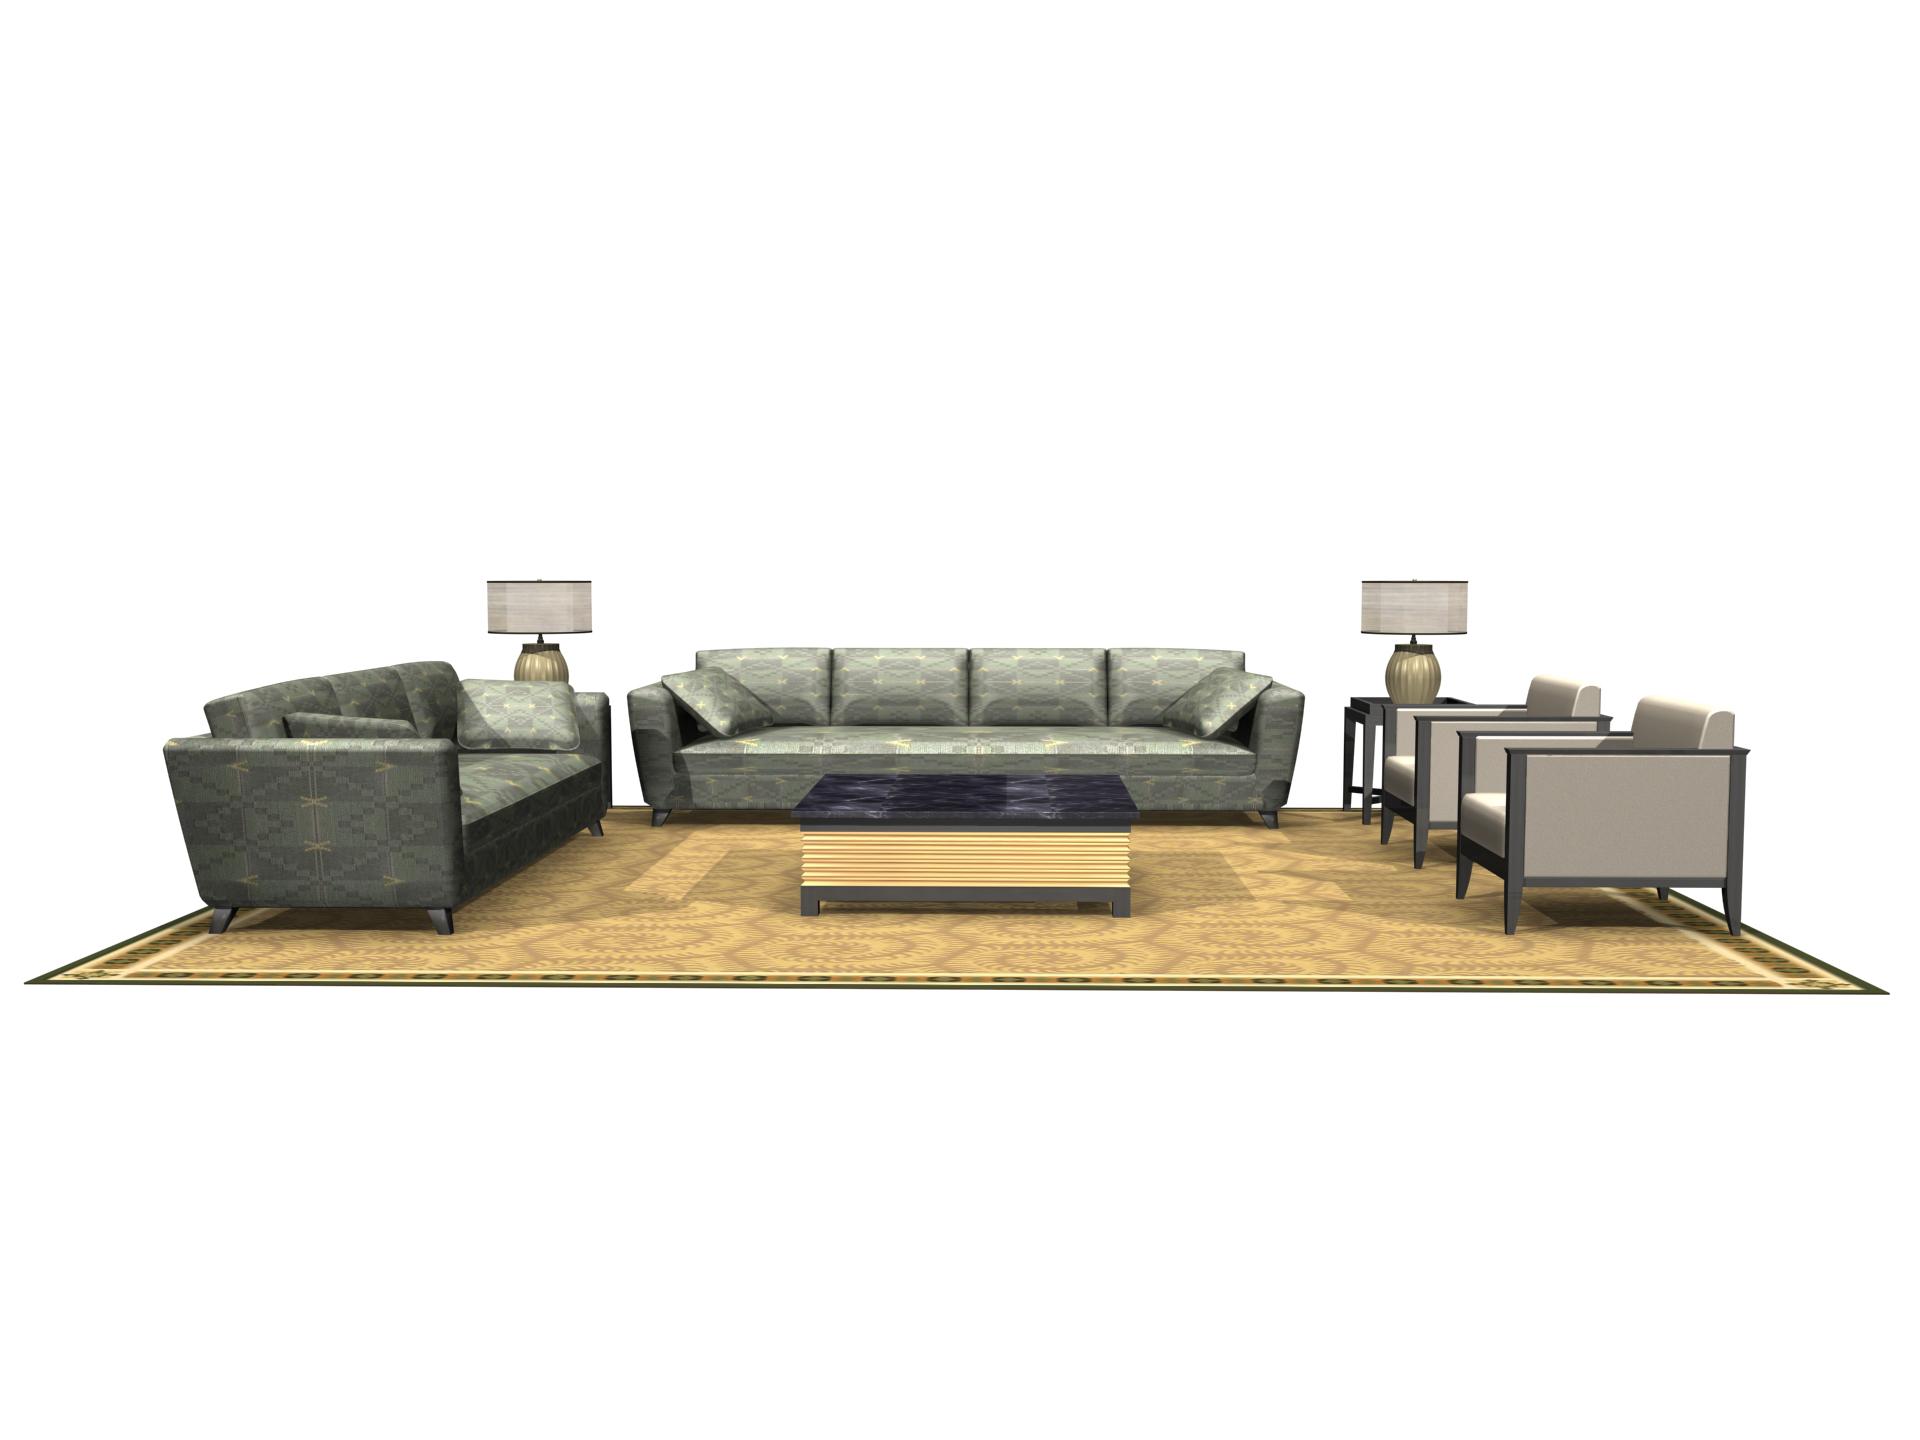 furniture – sas 006 3D Model